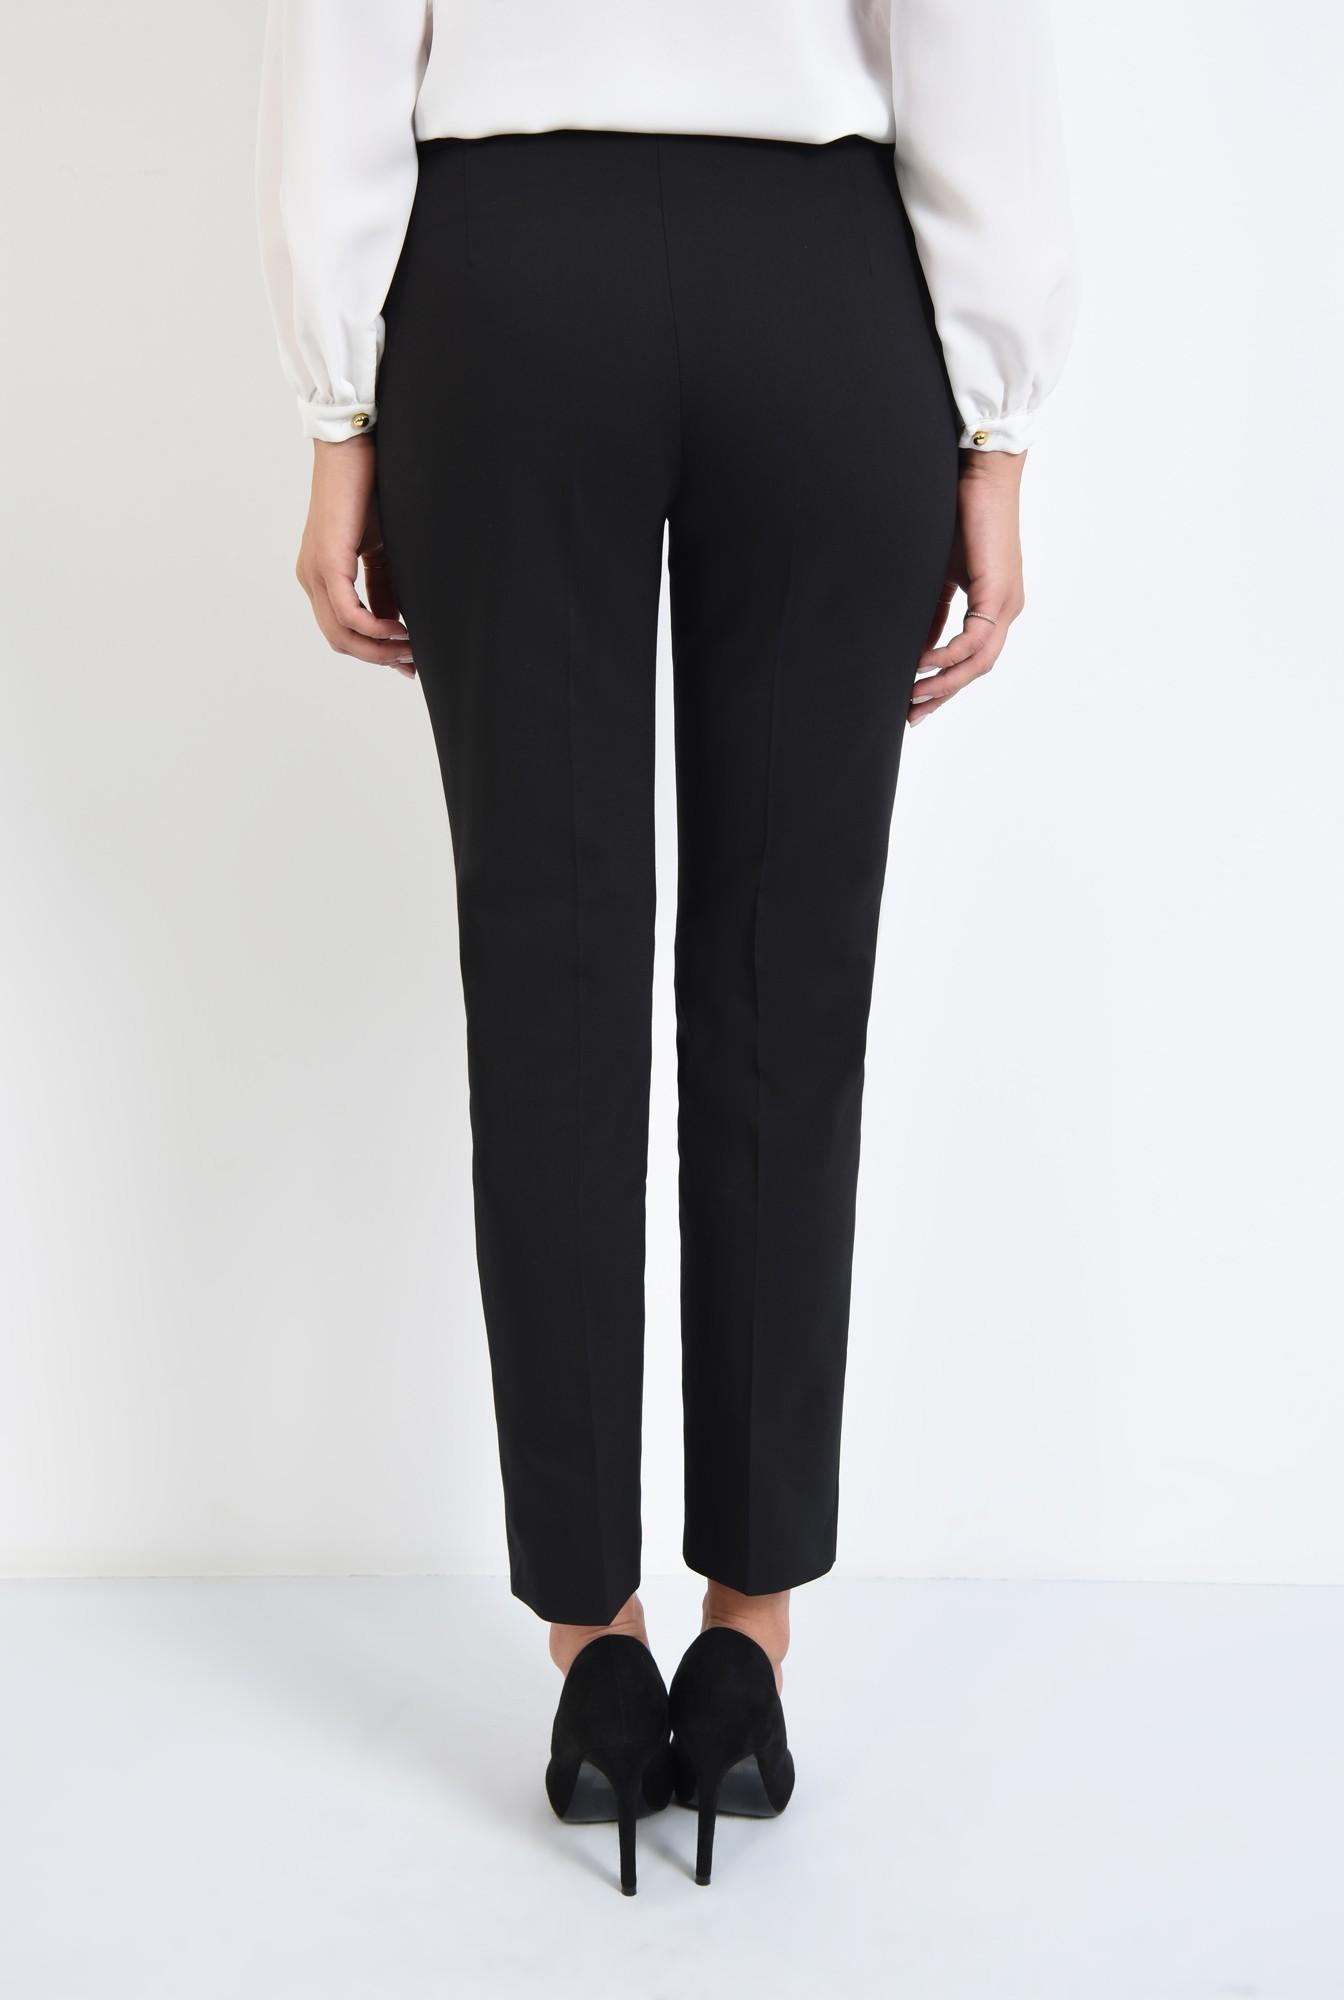 1 - pantaloni casual, negru, buzunare, cordon